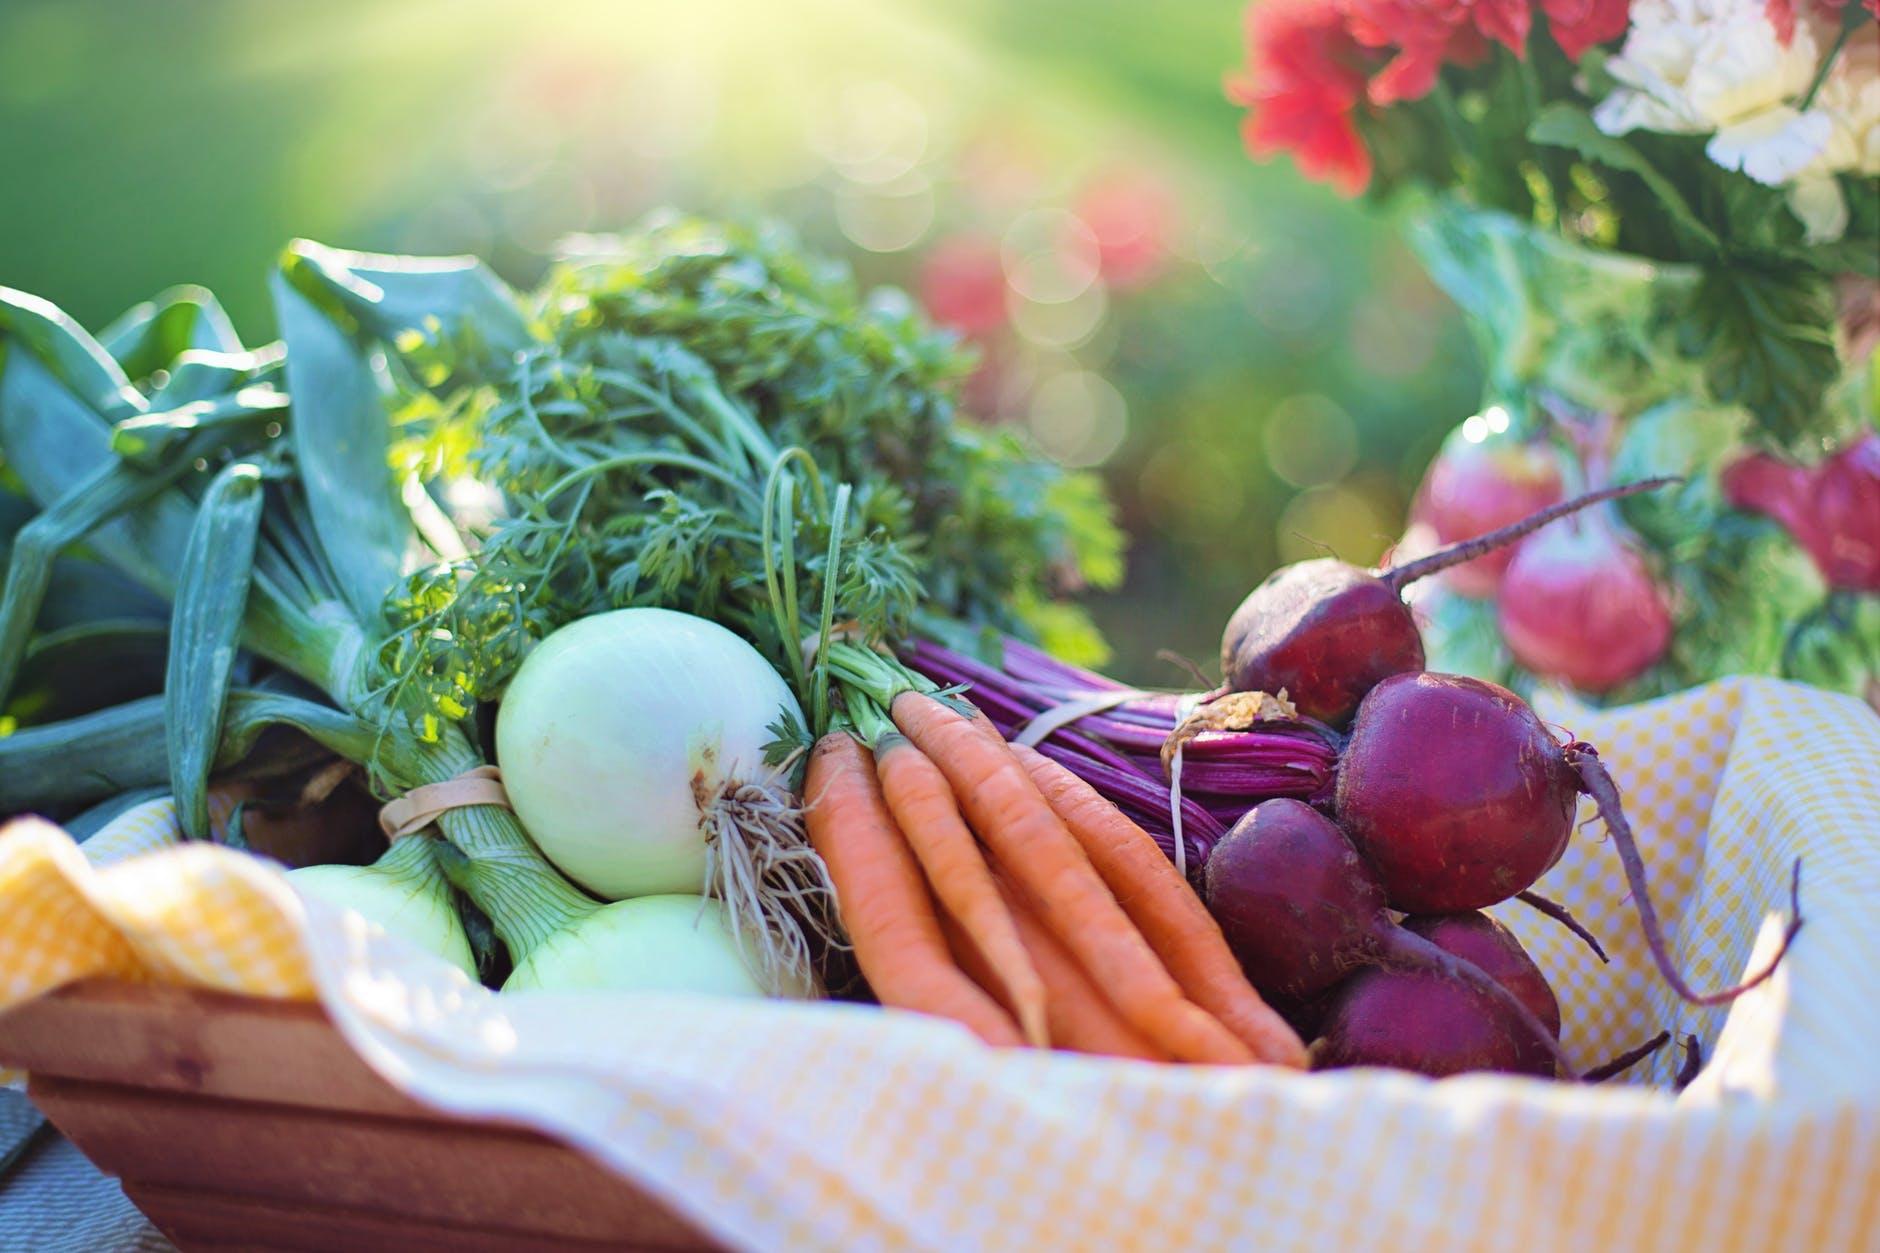 WholeFoods Market 发布2018年主导食品行业发展的十大趋势预测